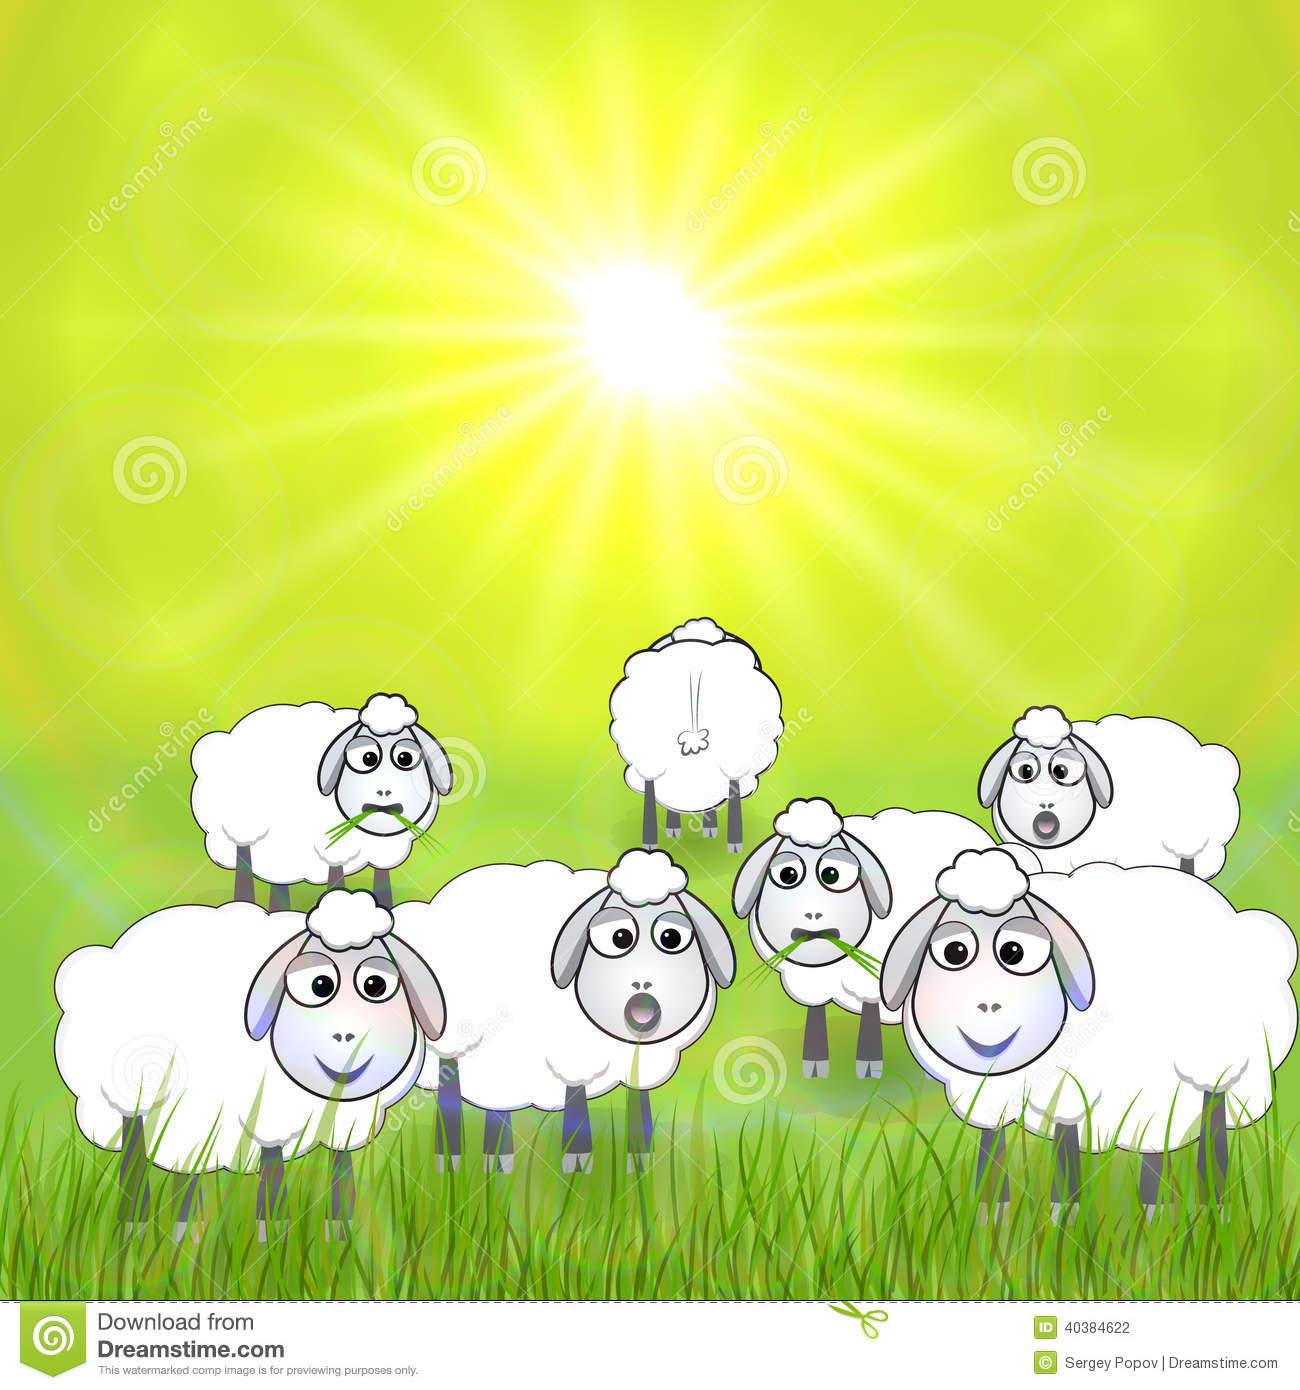 Similiar Meadow With Sheep Clip Art Keywords.